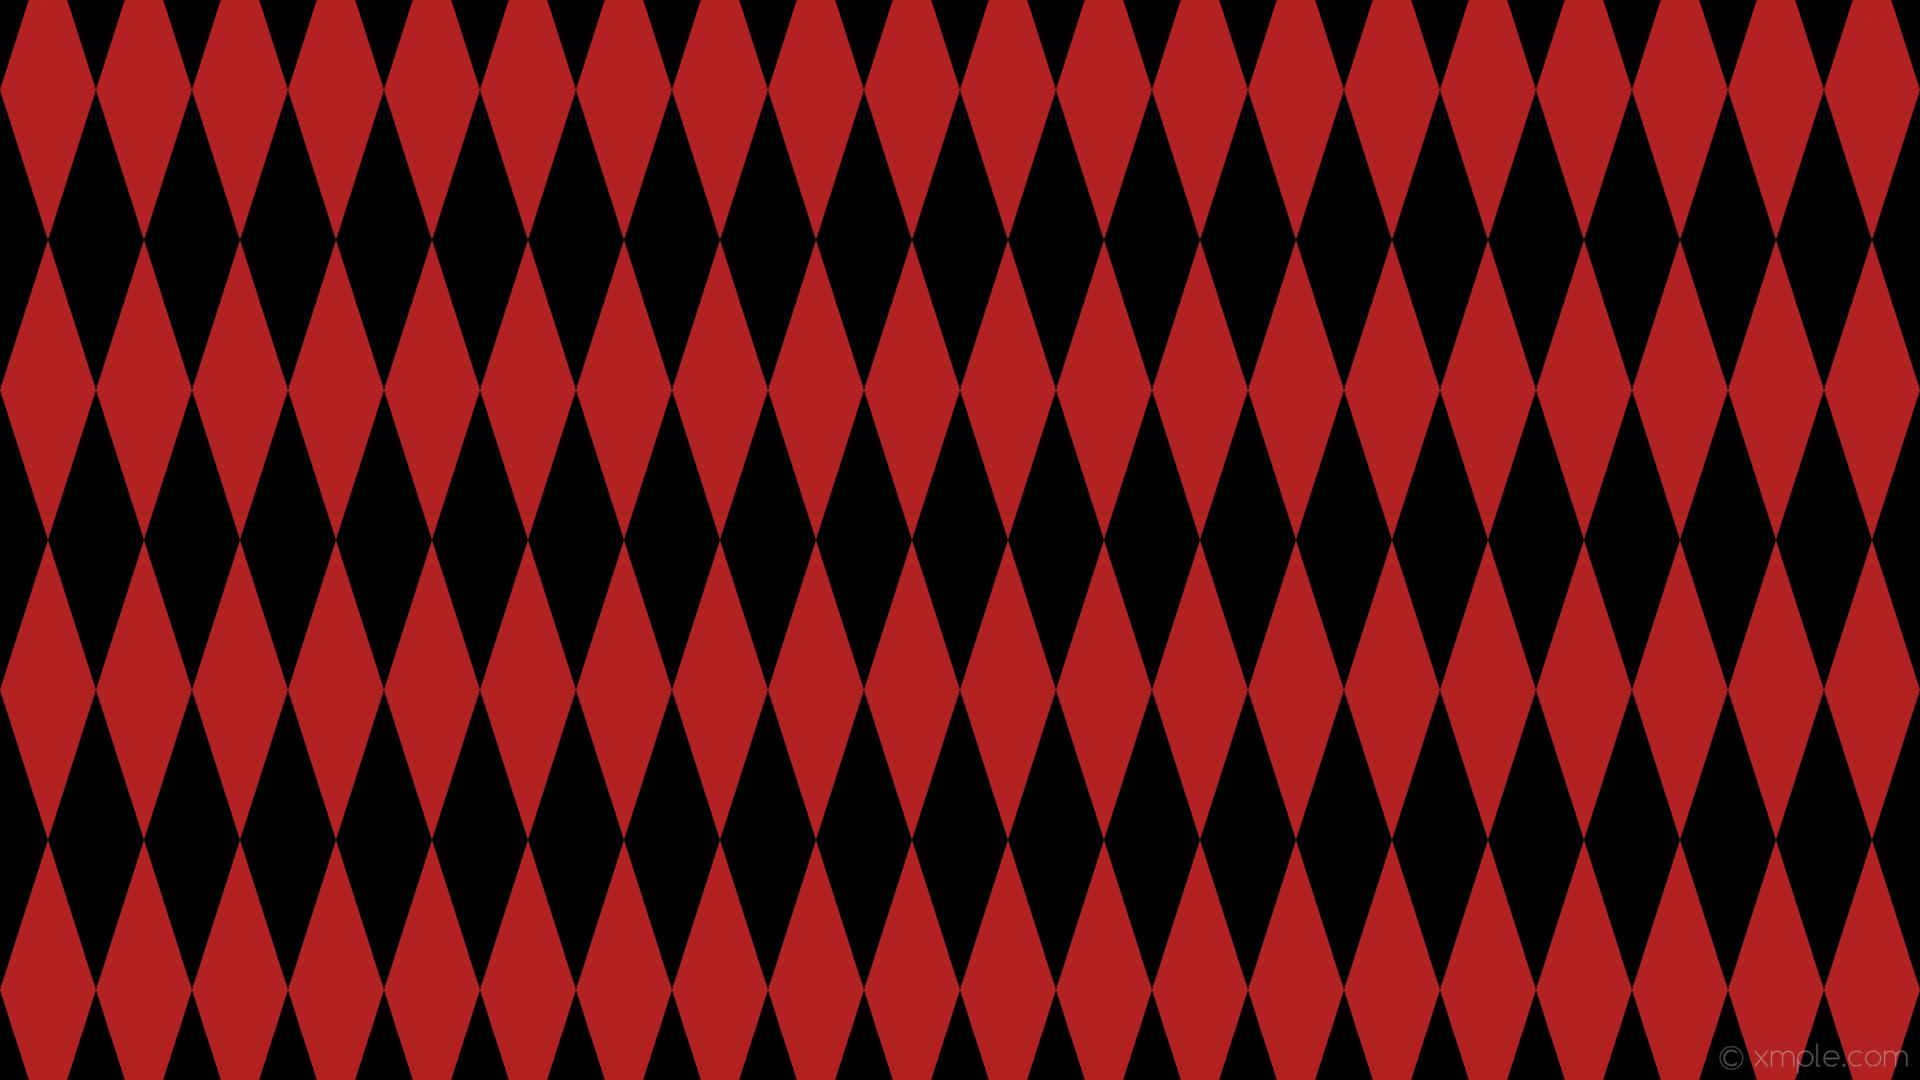 Res: 1920x1080, wallpaper red lozenge black diamond rhombus fire brick #000000 #b22222 90°  300px 96px